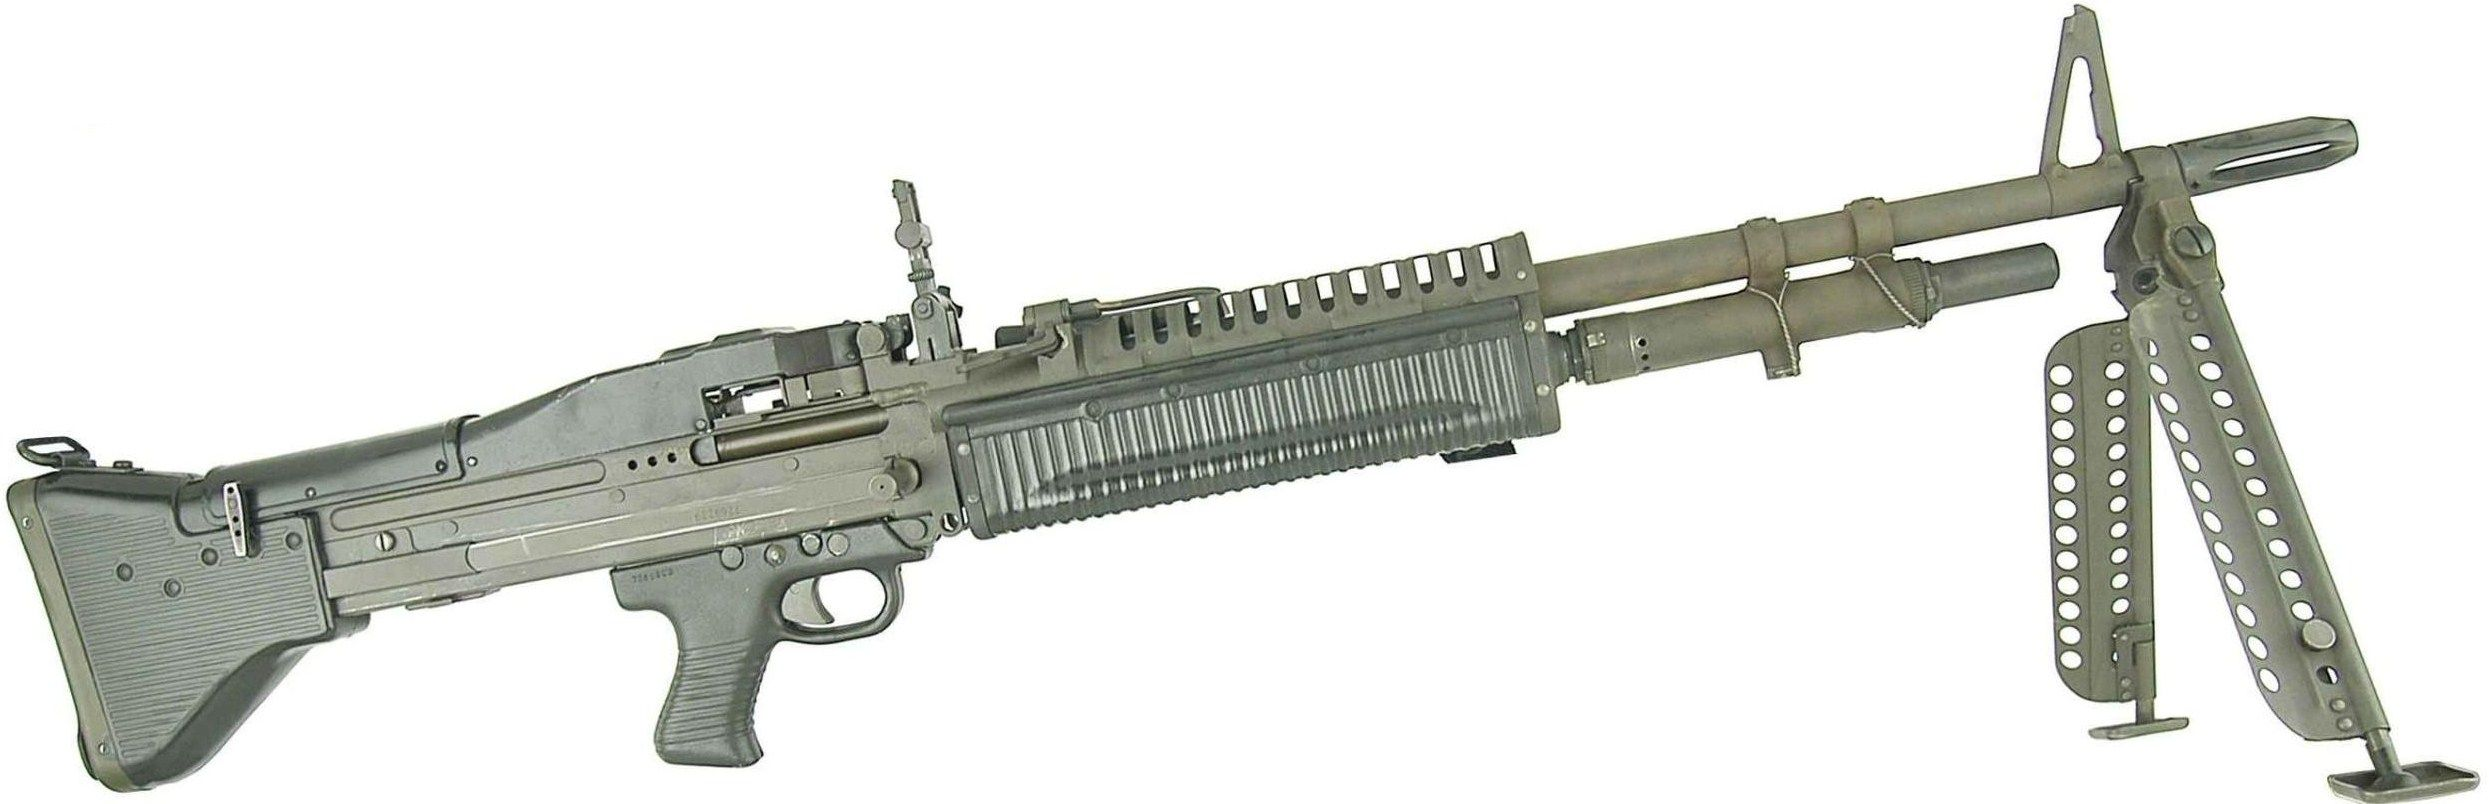 RAMBO FILM M60 MACHINE GUN ACTION ART HUGE LARGE  GIANT POSTER PRINT